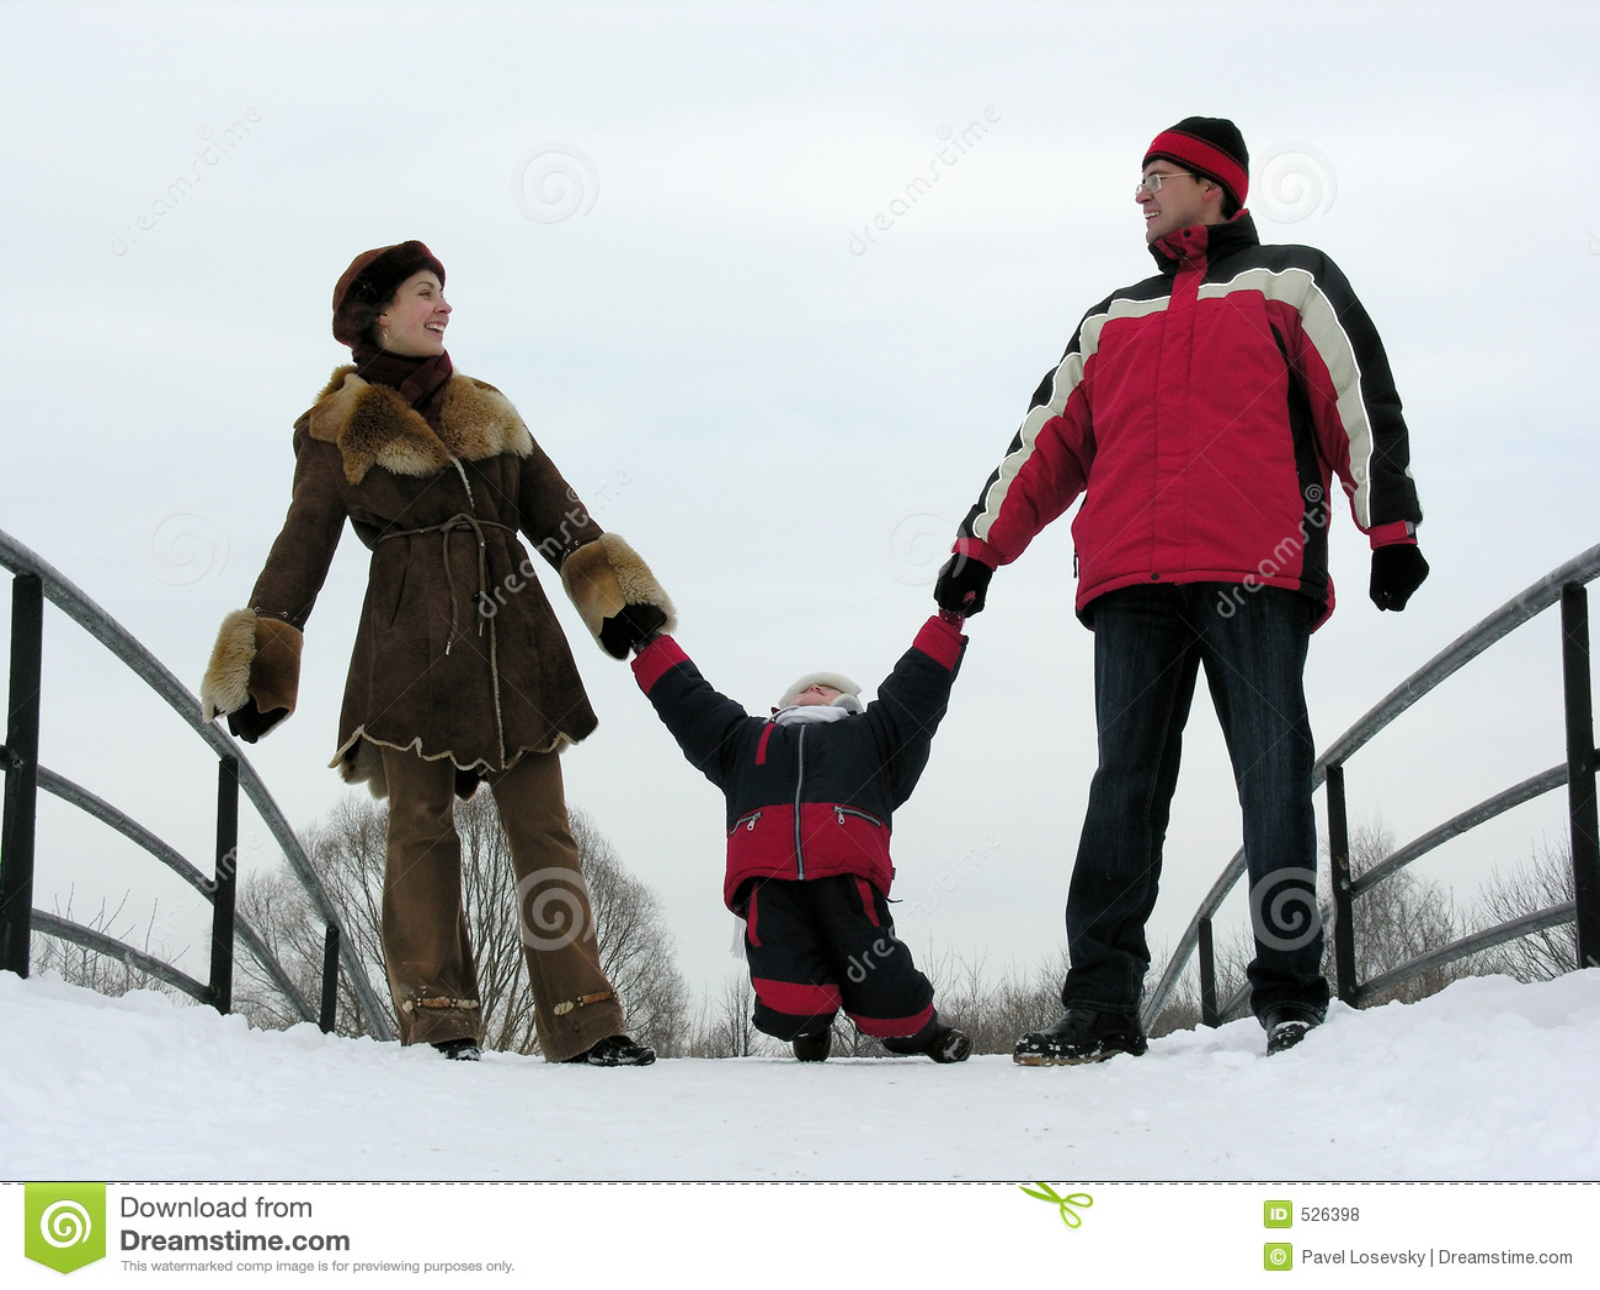 Download 系列三 库存照片. 图片 包括有 父亲, 妈妈, 情感, 云彩, 室外, 联络, 女孩, 逗人喜爱, 节假日 - 526398